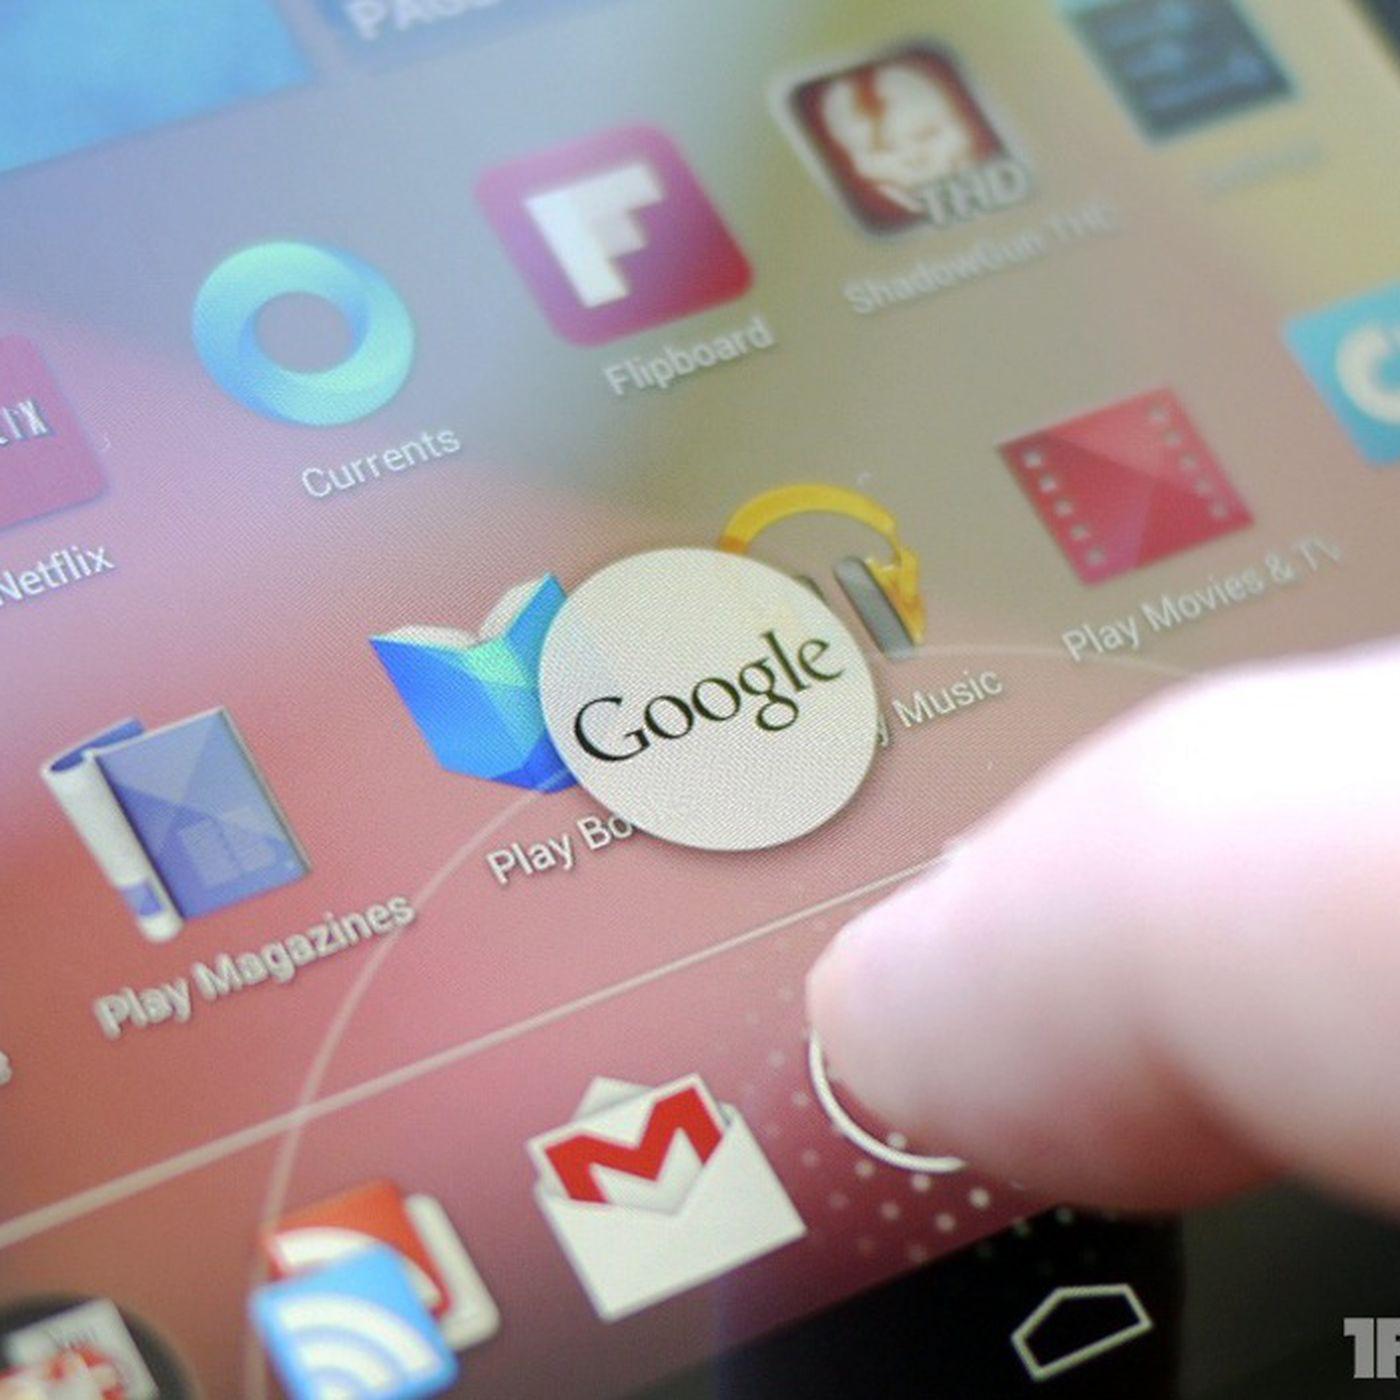 Google Nexus 7 review | The Verge